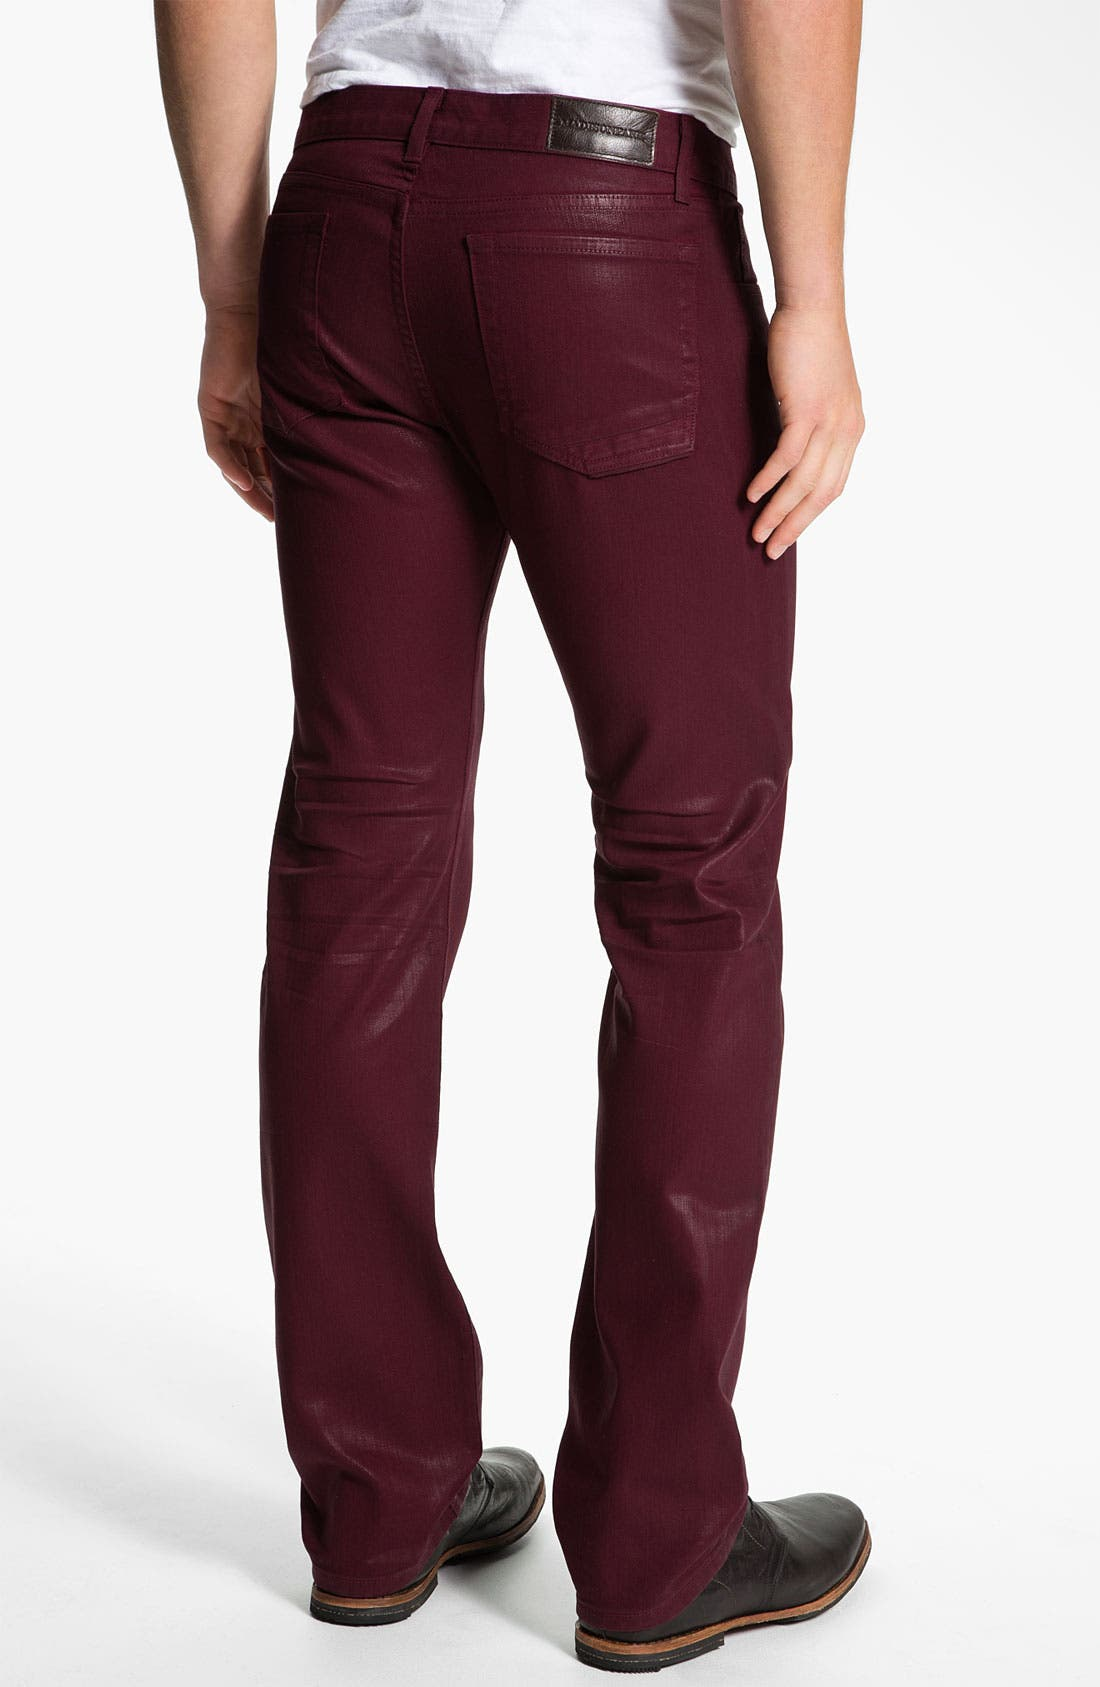 Alternate Image 1 Selected - Madisonpark Collective 'Miles' Slim Straight Leg Jeans (Merlot)